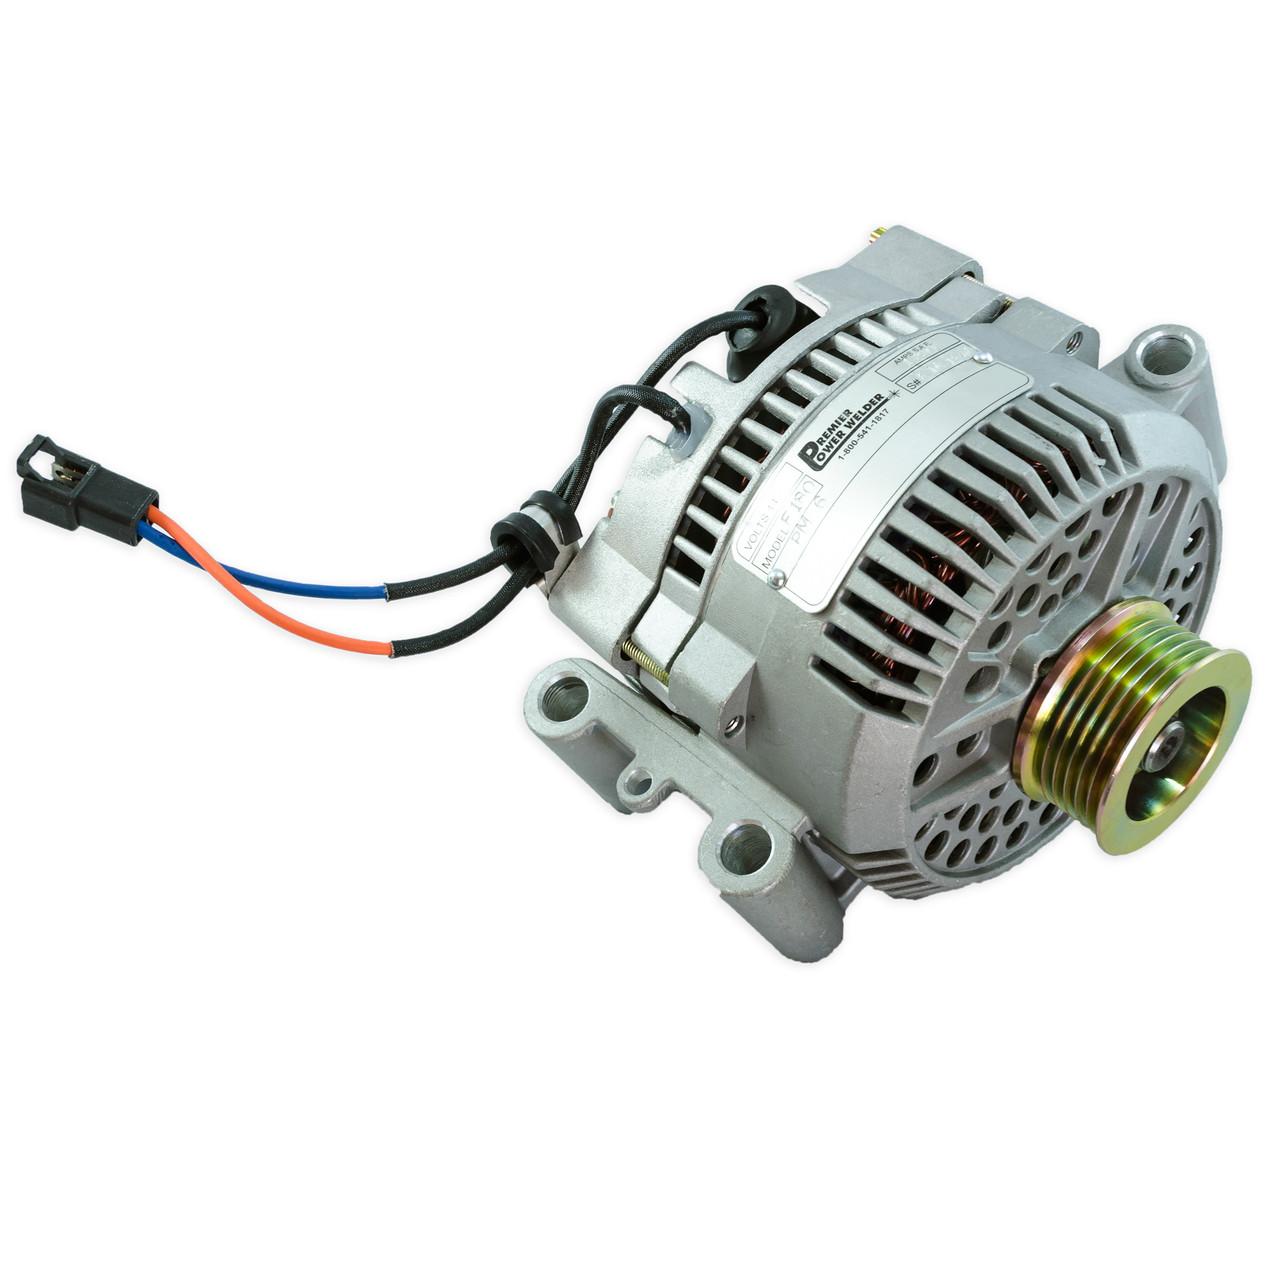 ford bronco 1993 1996, 180 amps high output \u0026 welding alternator Ford Truck Alternator Wiring Diagram